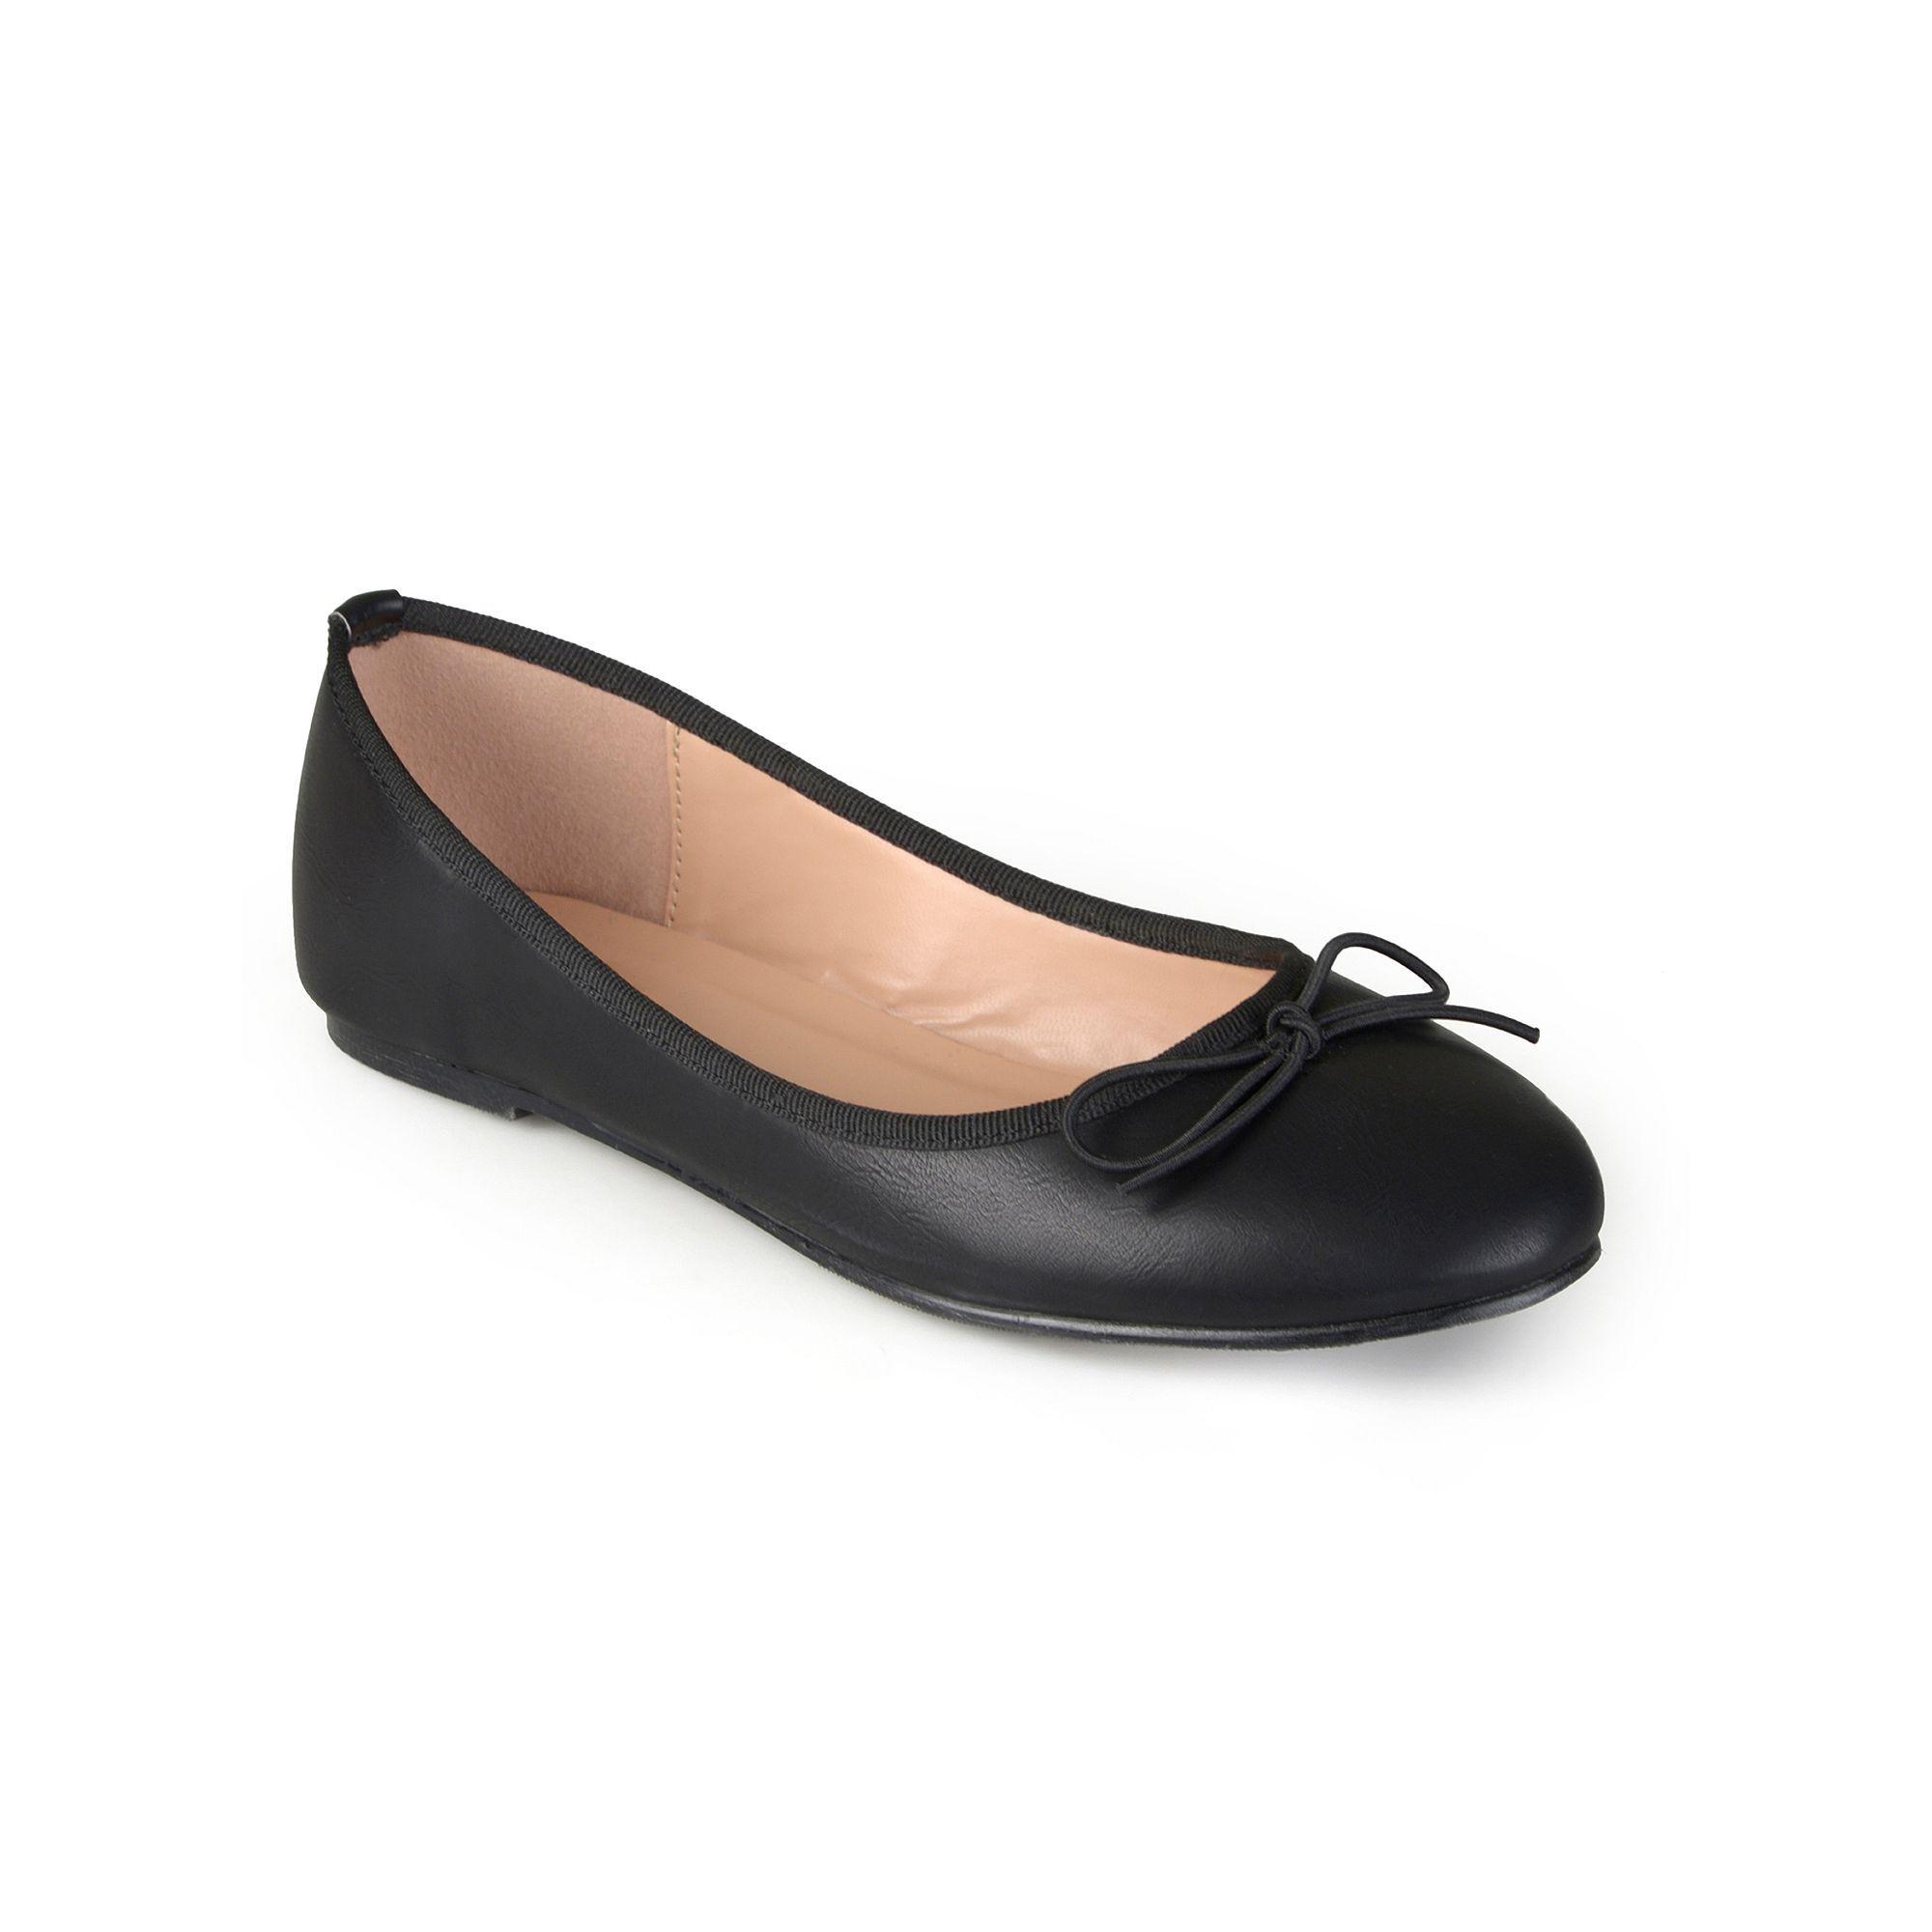 f75b1f2d3 Journee Collection Vika Women's Ballet Flats, Teens, Size: medium (7.5),  Black